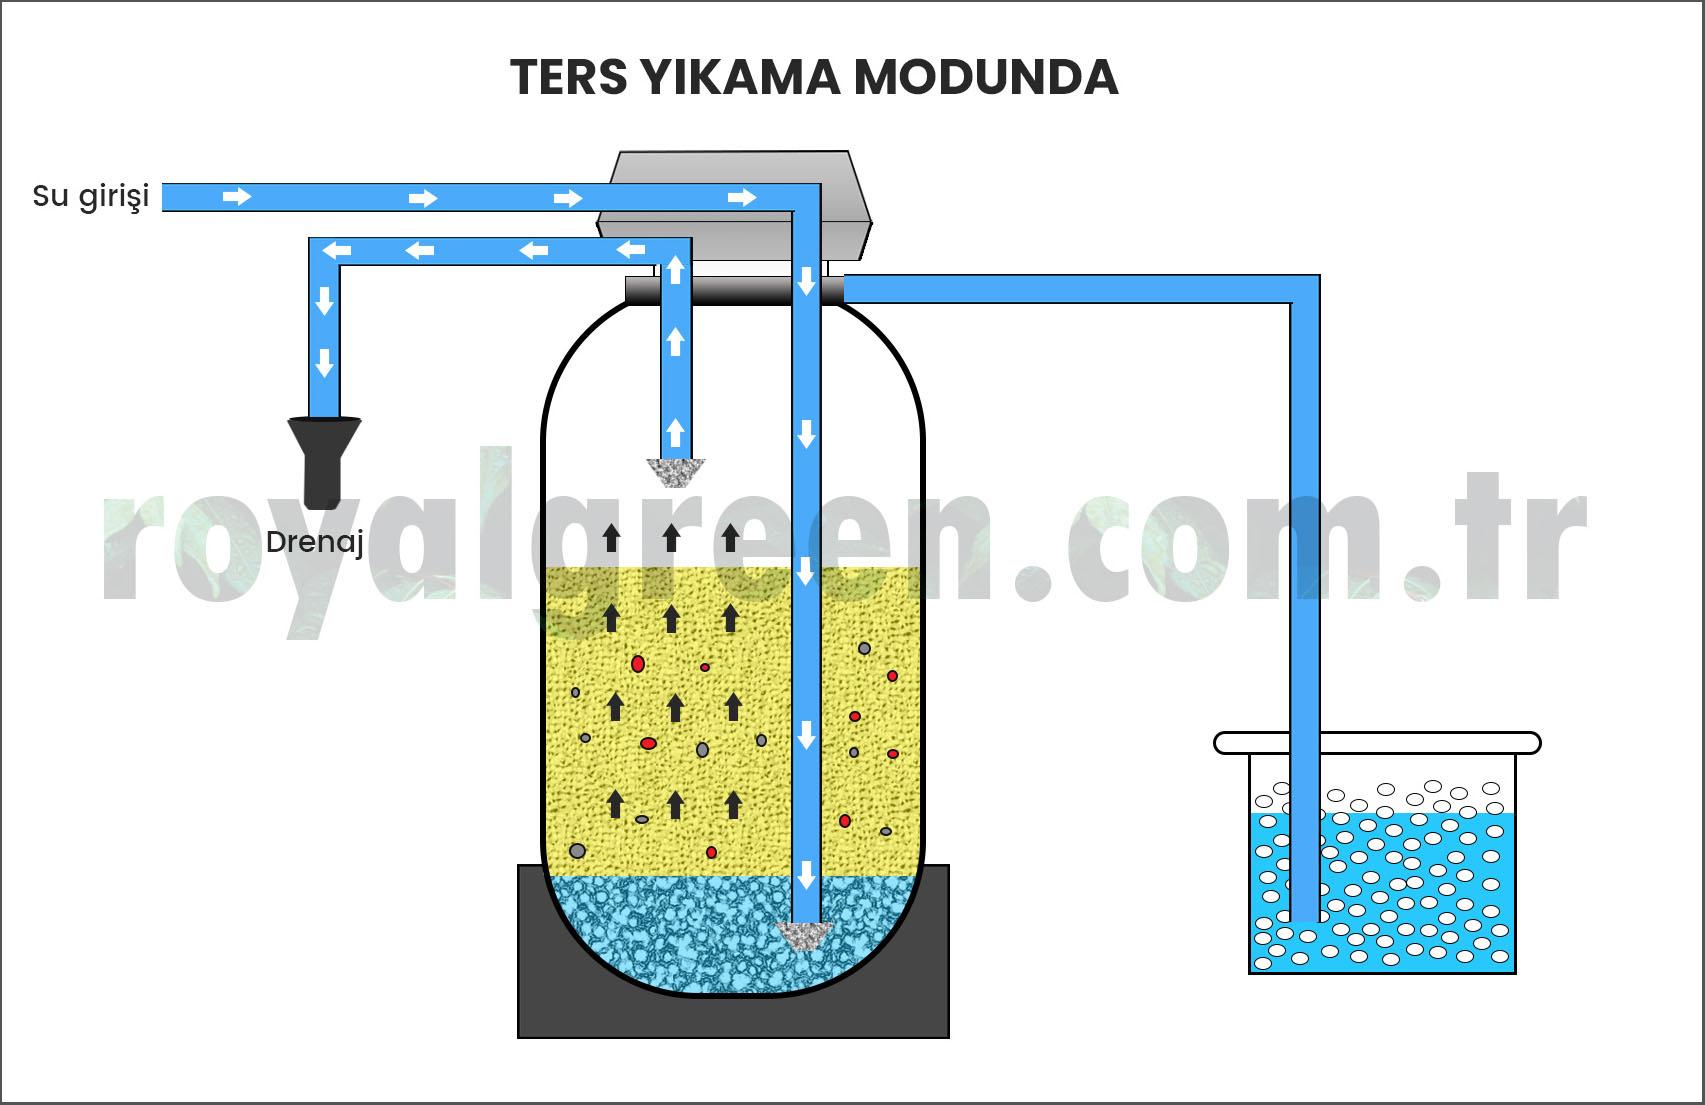 Softlime su yumuşatma cihazı ters yıkama modunda nasıl çalışır